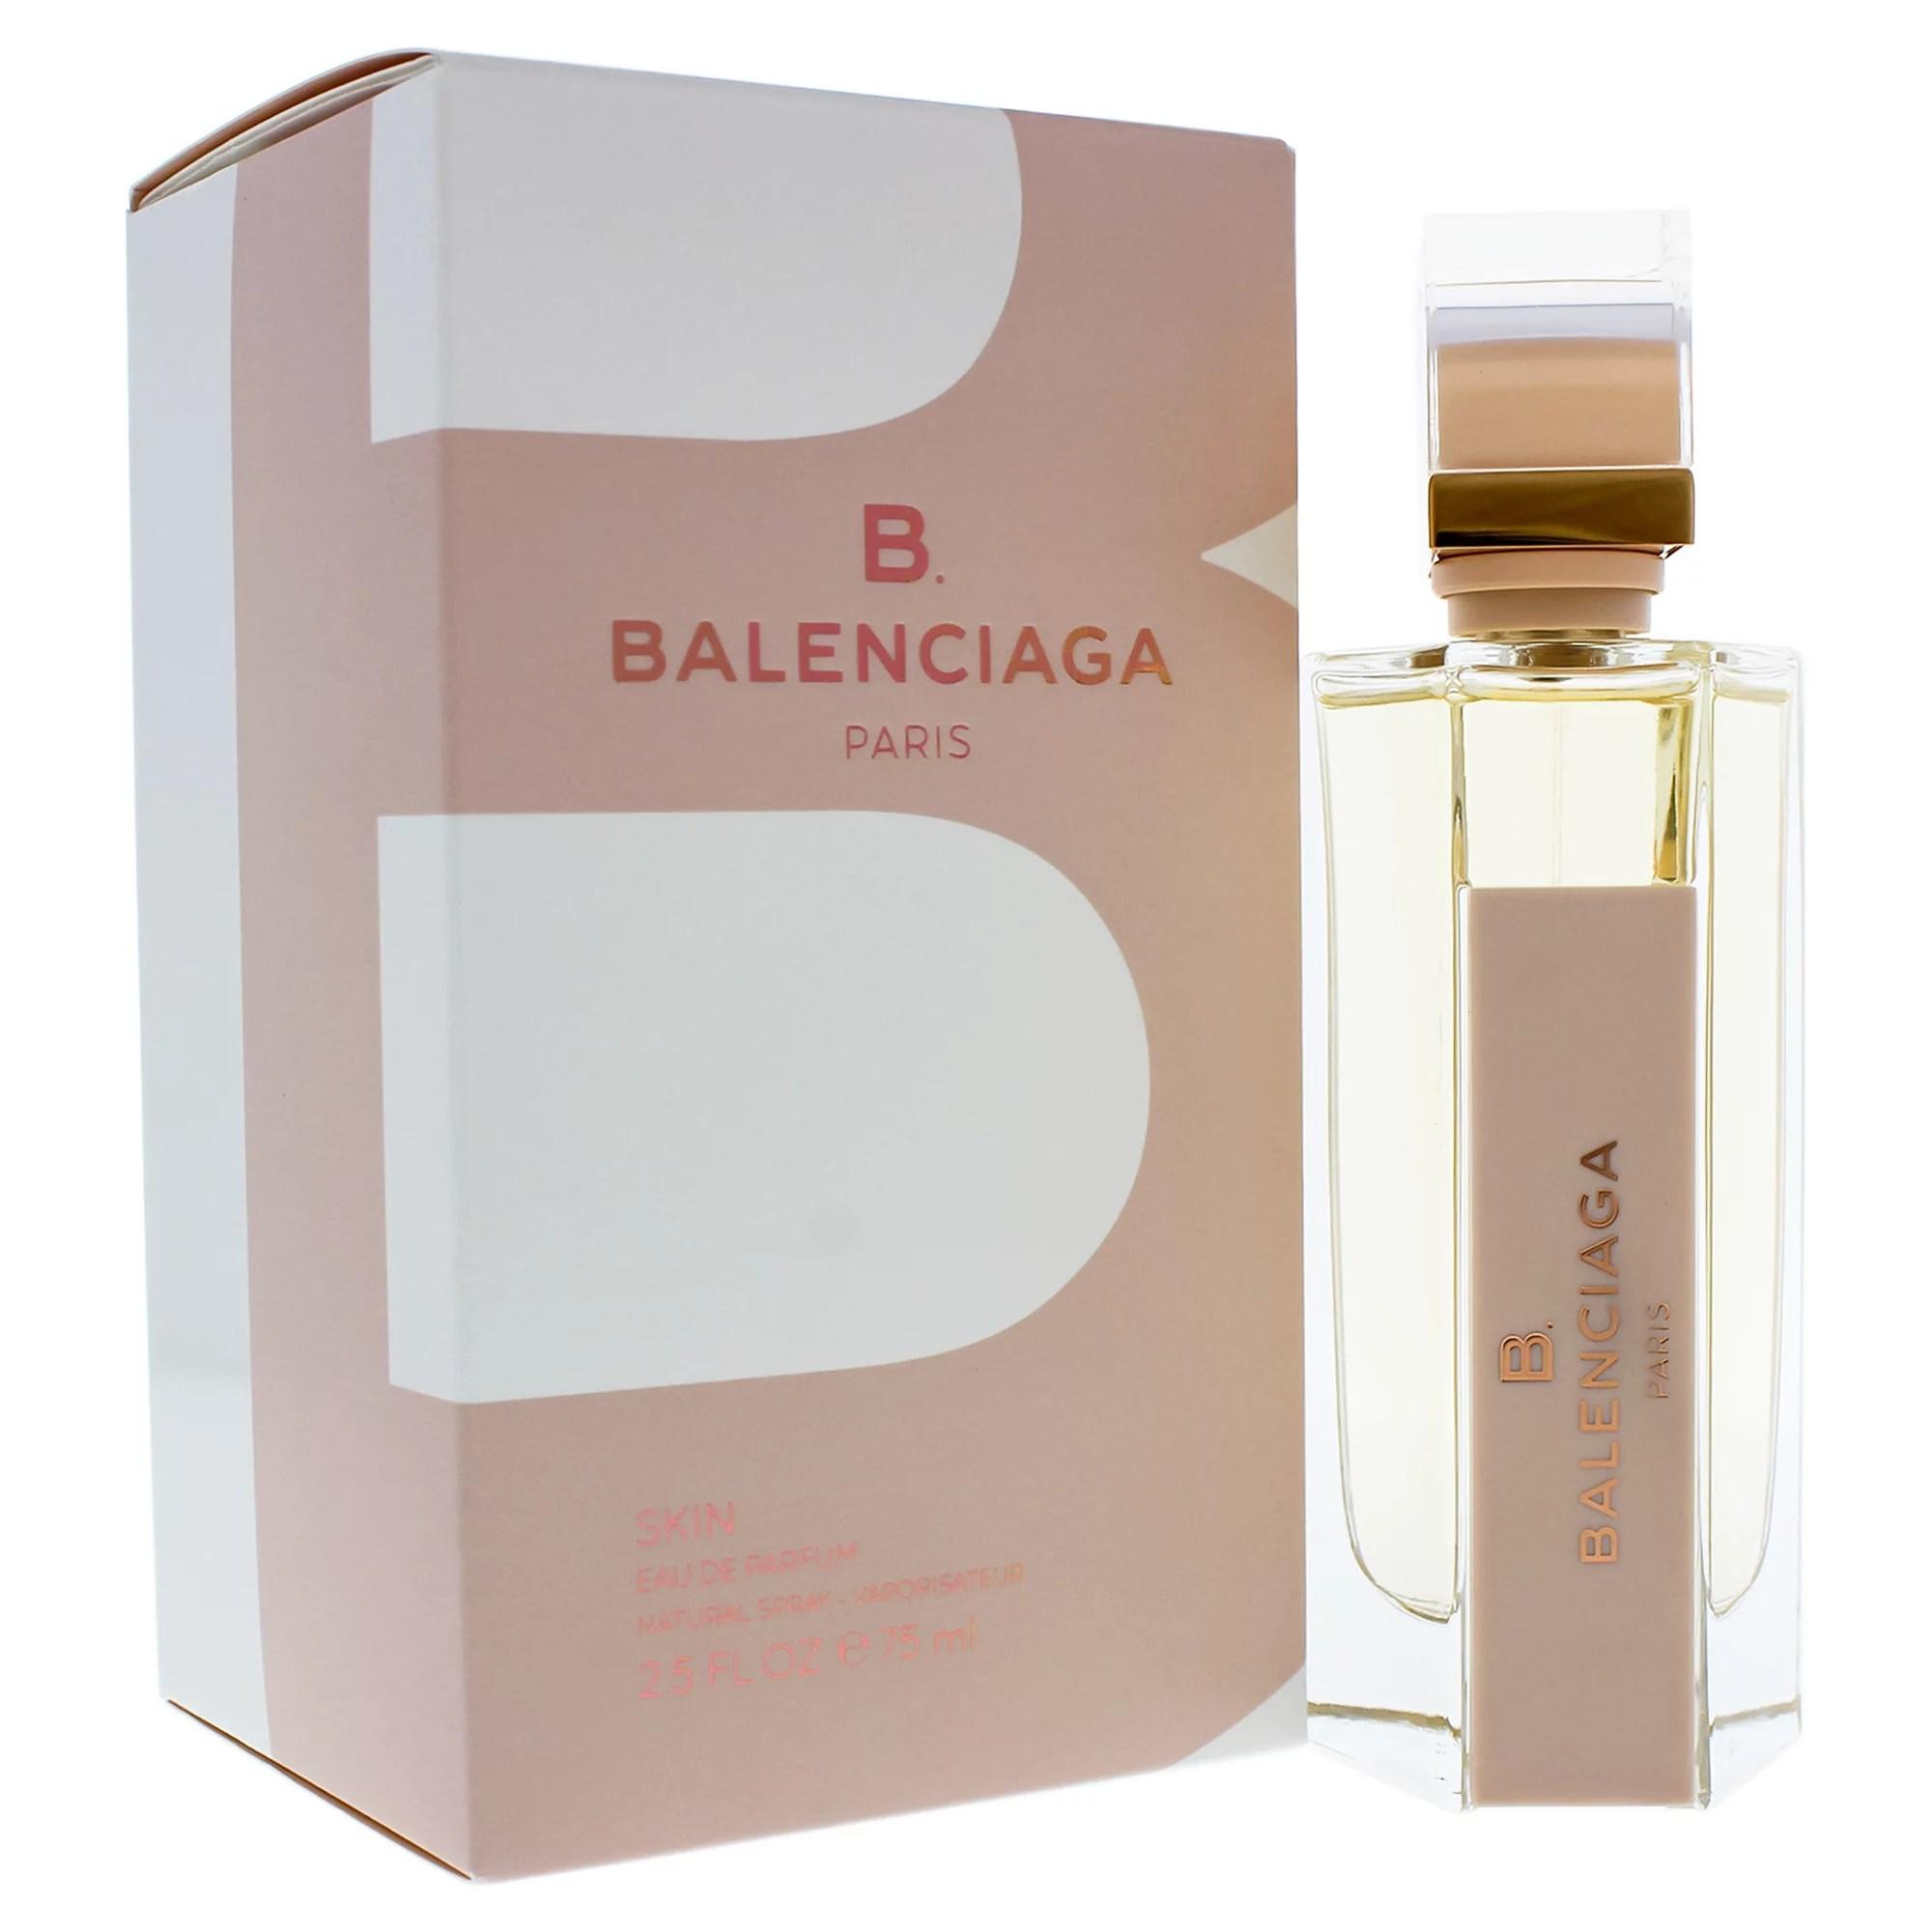 B Skin by Balenciaga for Women – 2.5 oz EDP Spray